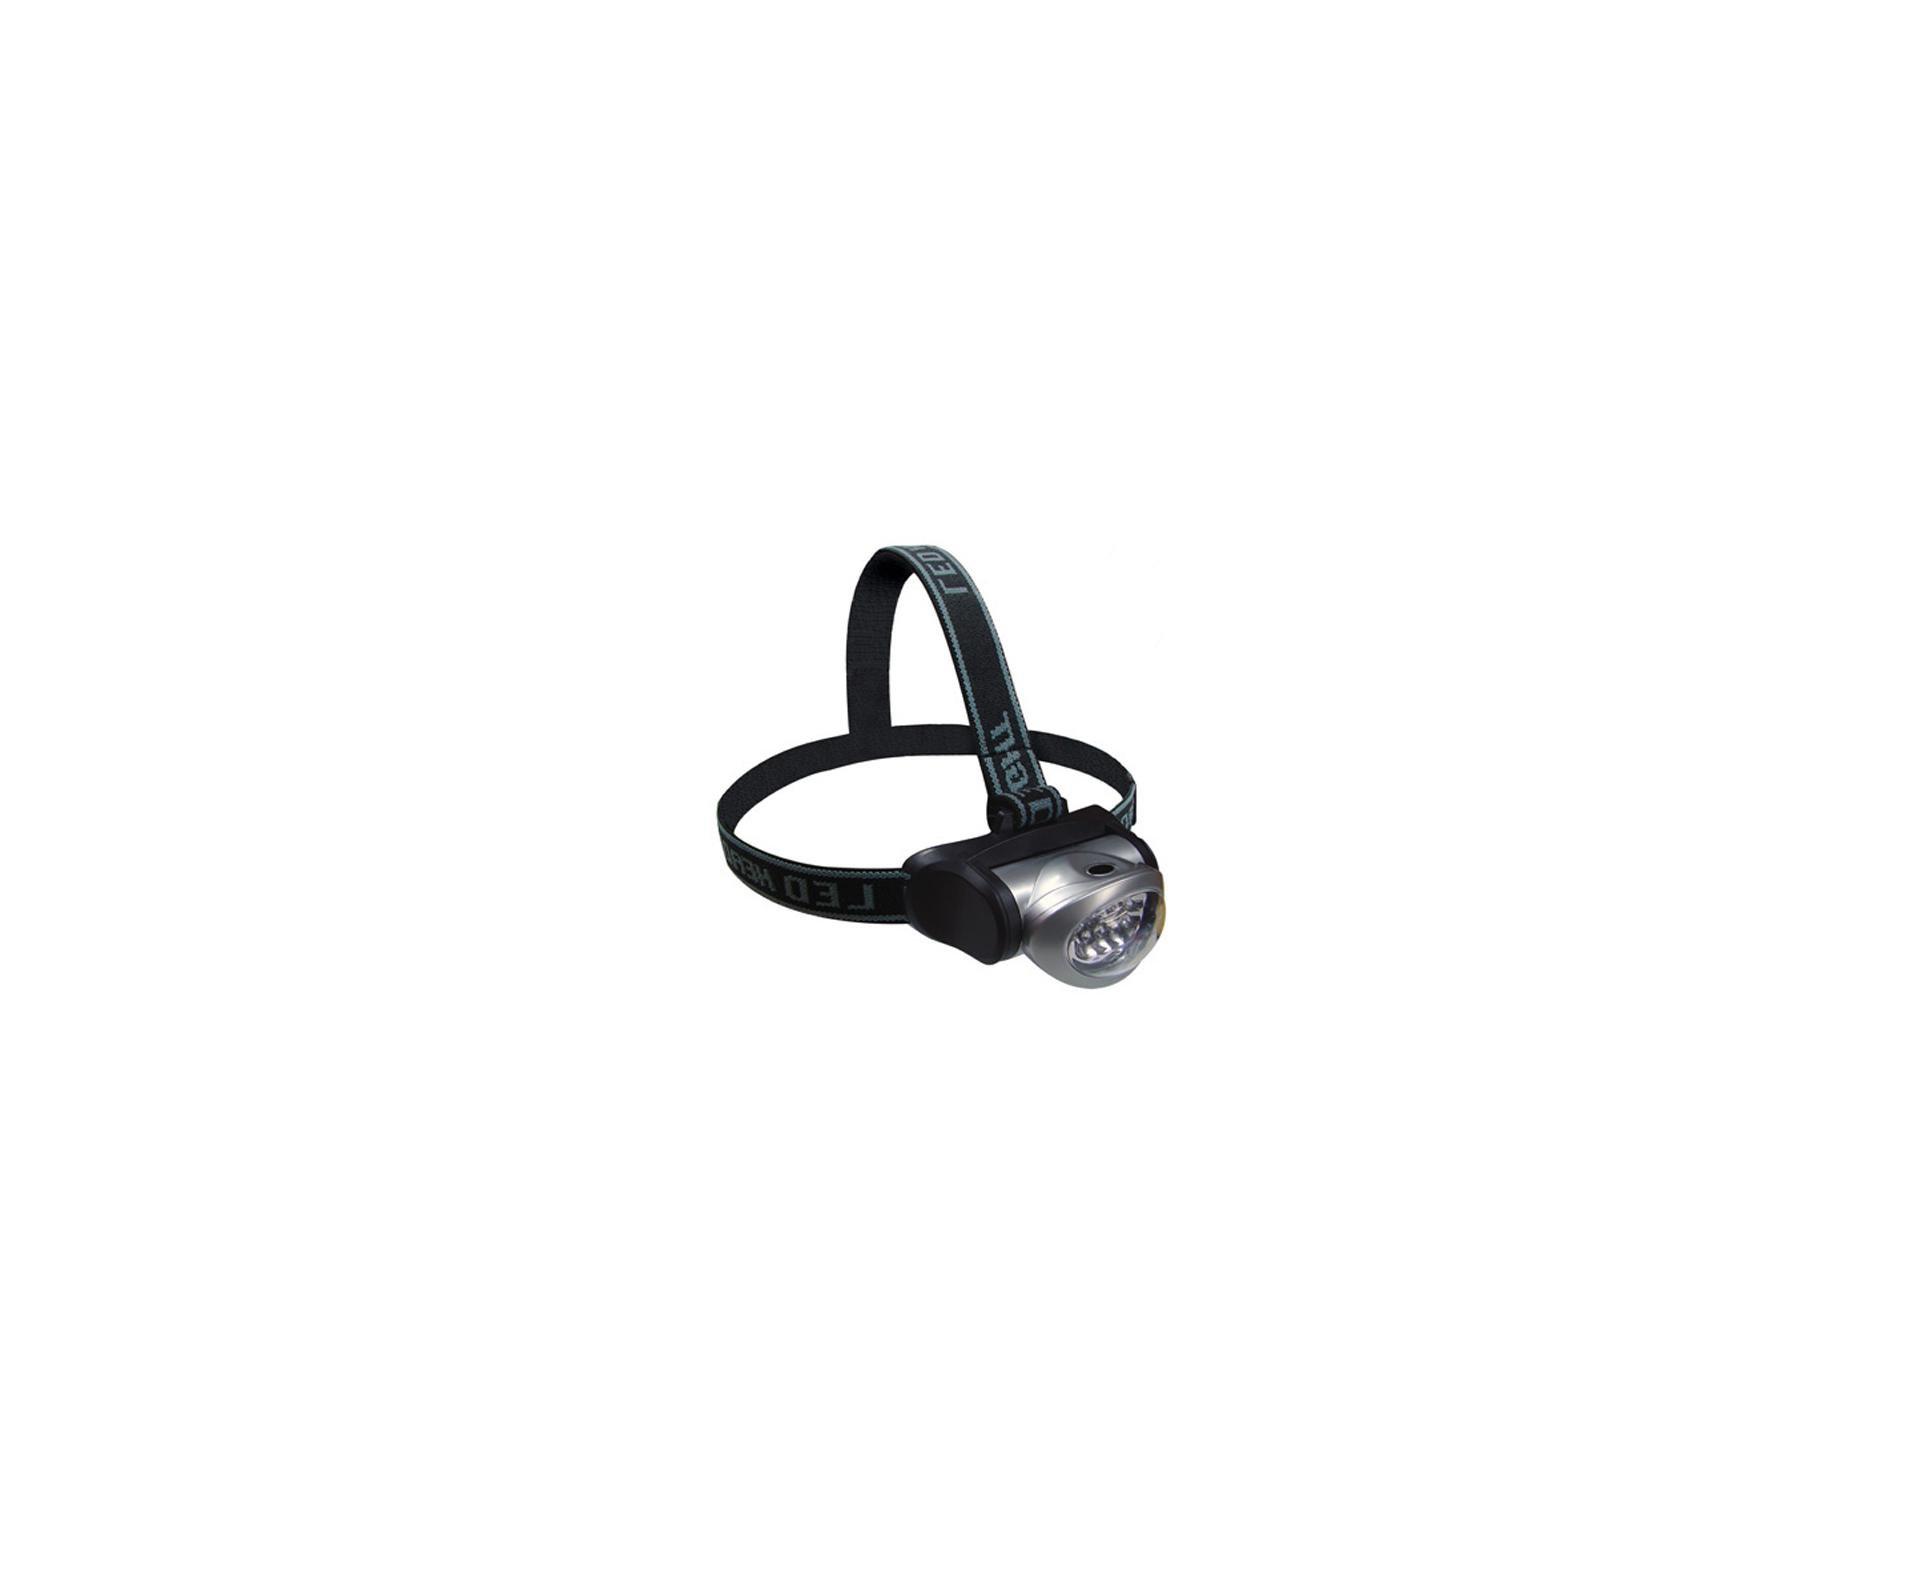 Lanterna De Cabeça Turboled - Nautika